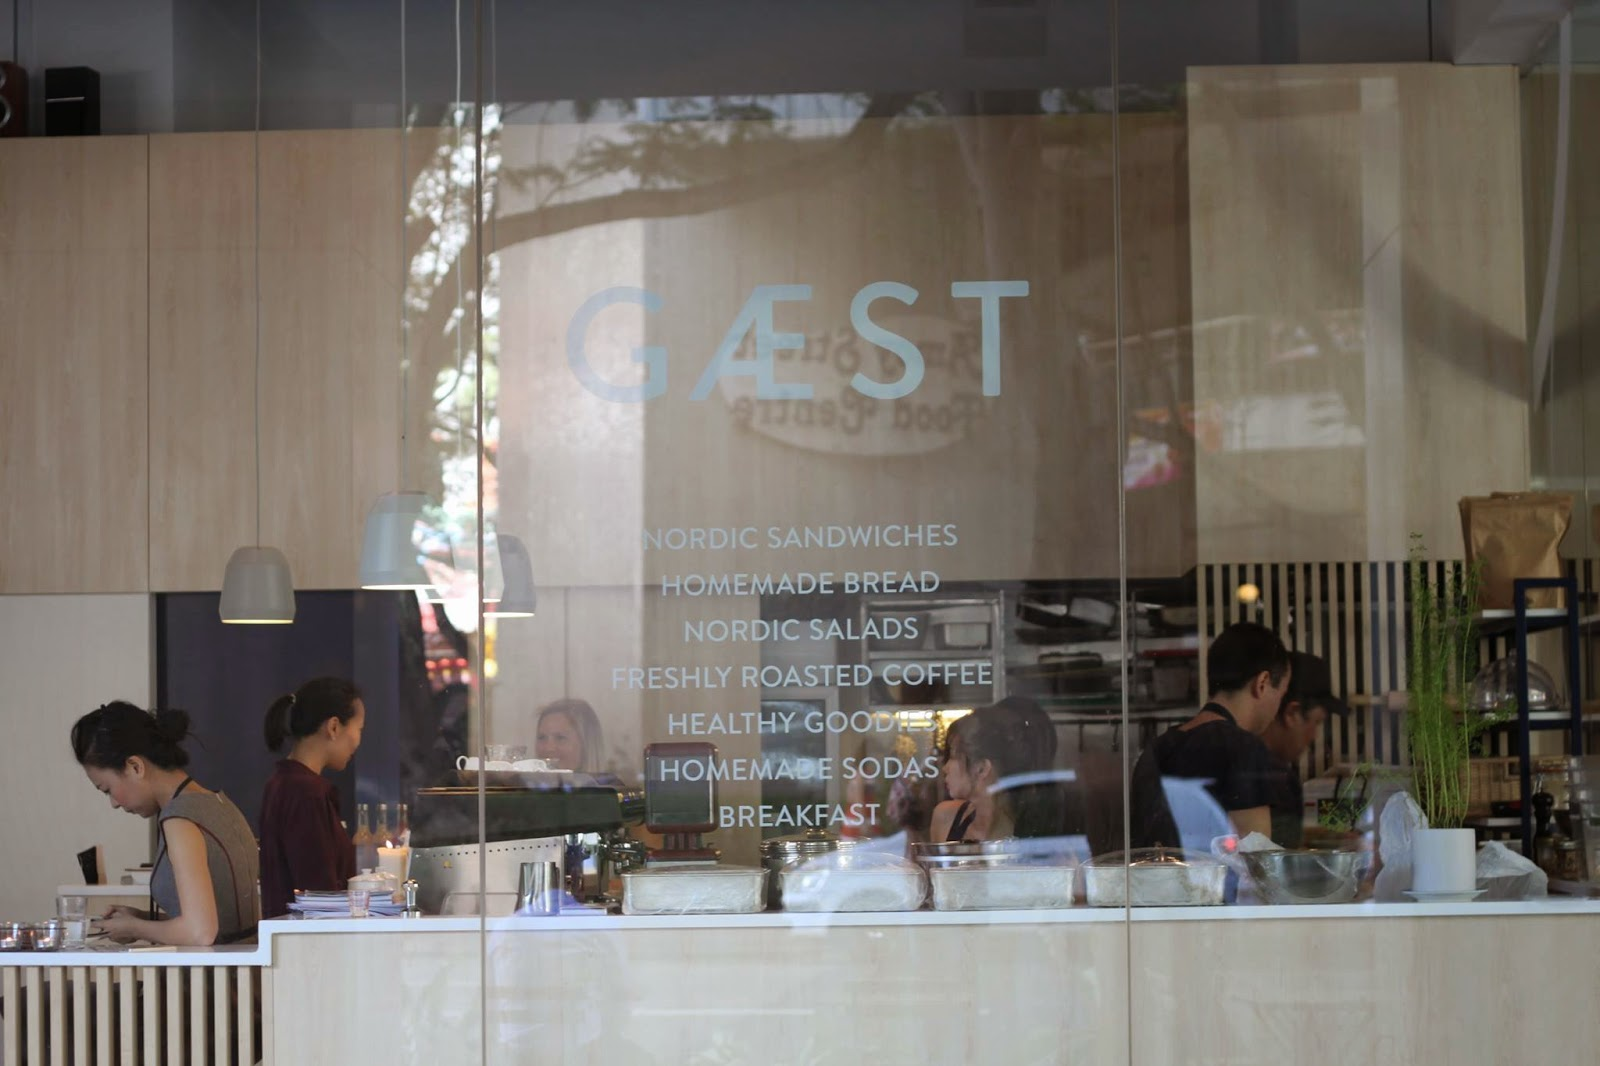 Gaest Cafe